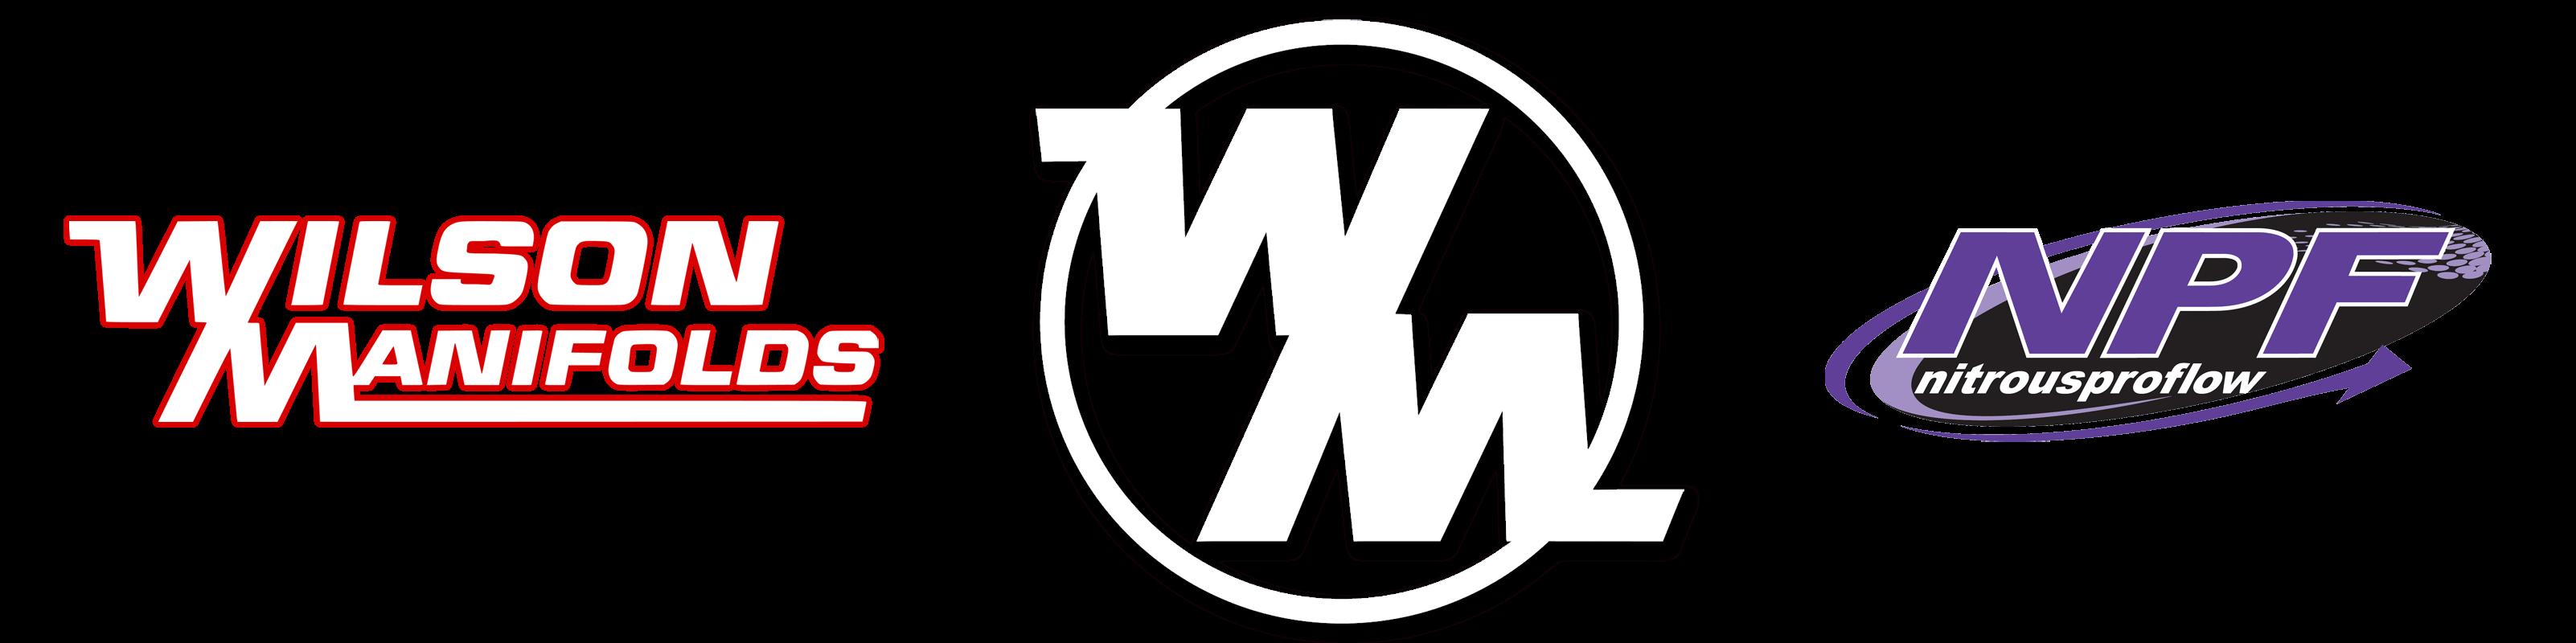 Wilson Manifolds